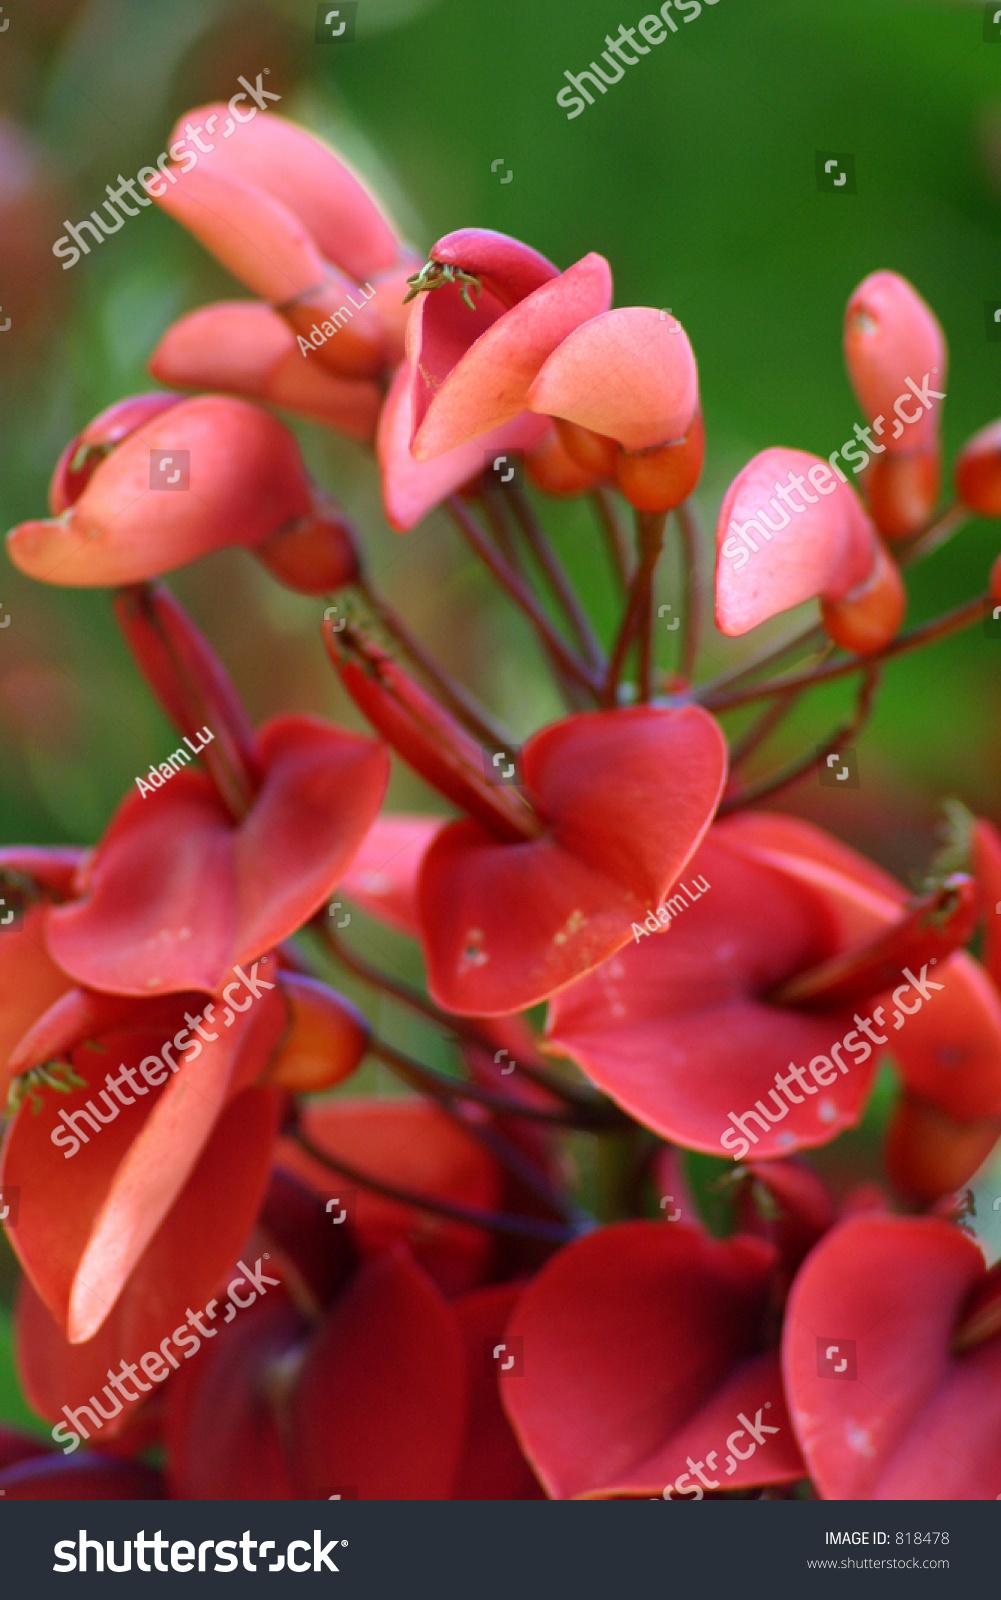 Beautiful exotic flower stock photo royalty free 818478 shutterstock beautiful exotic flower izmirmasajfo